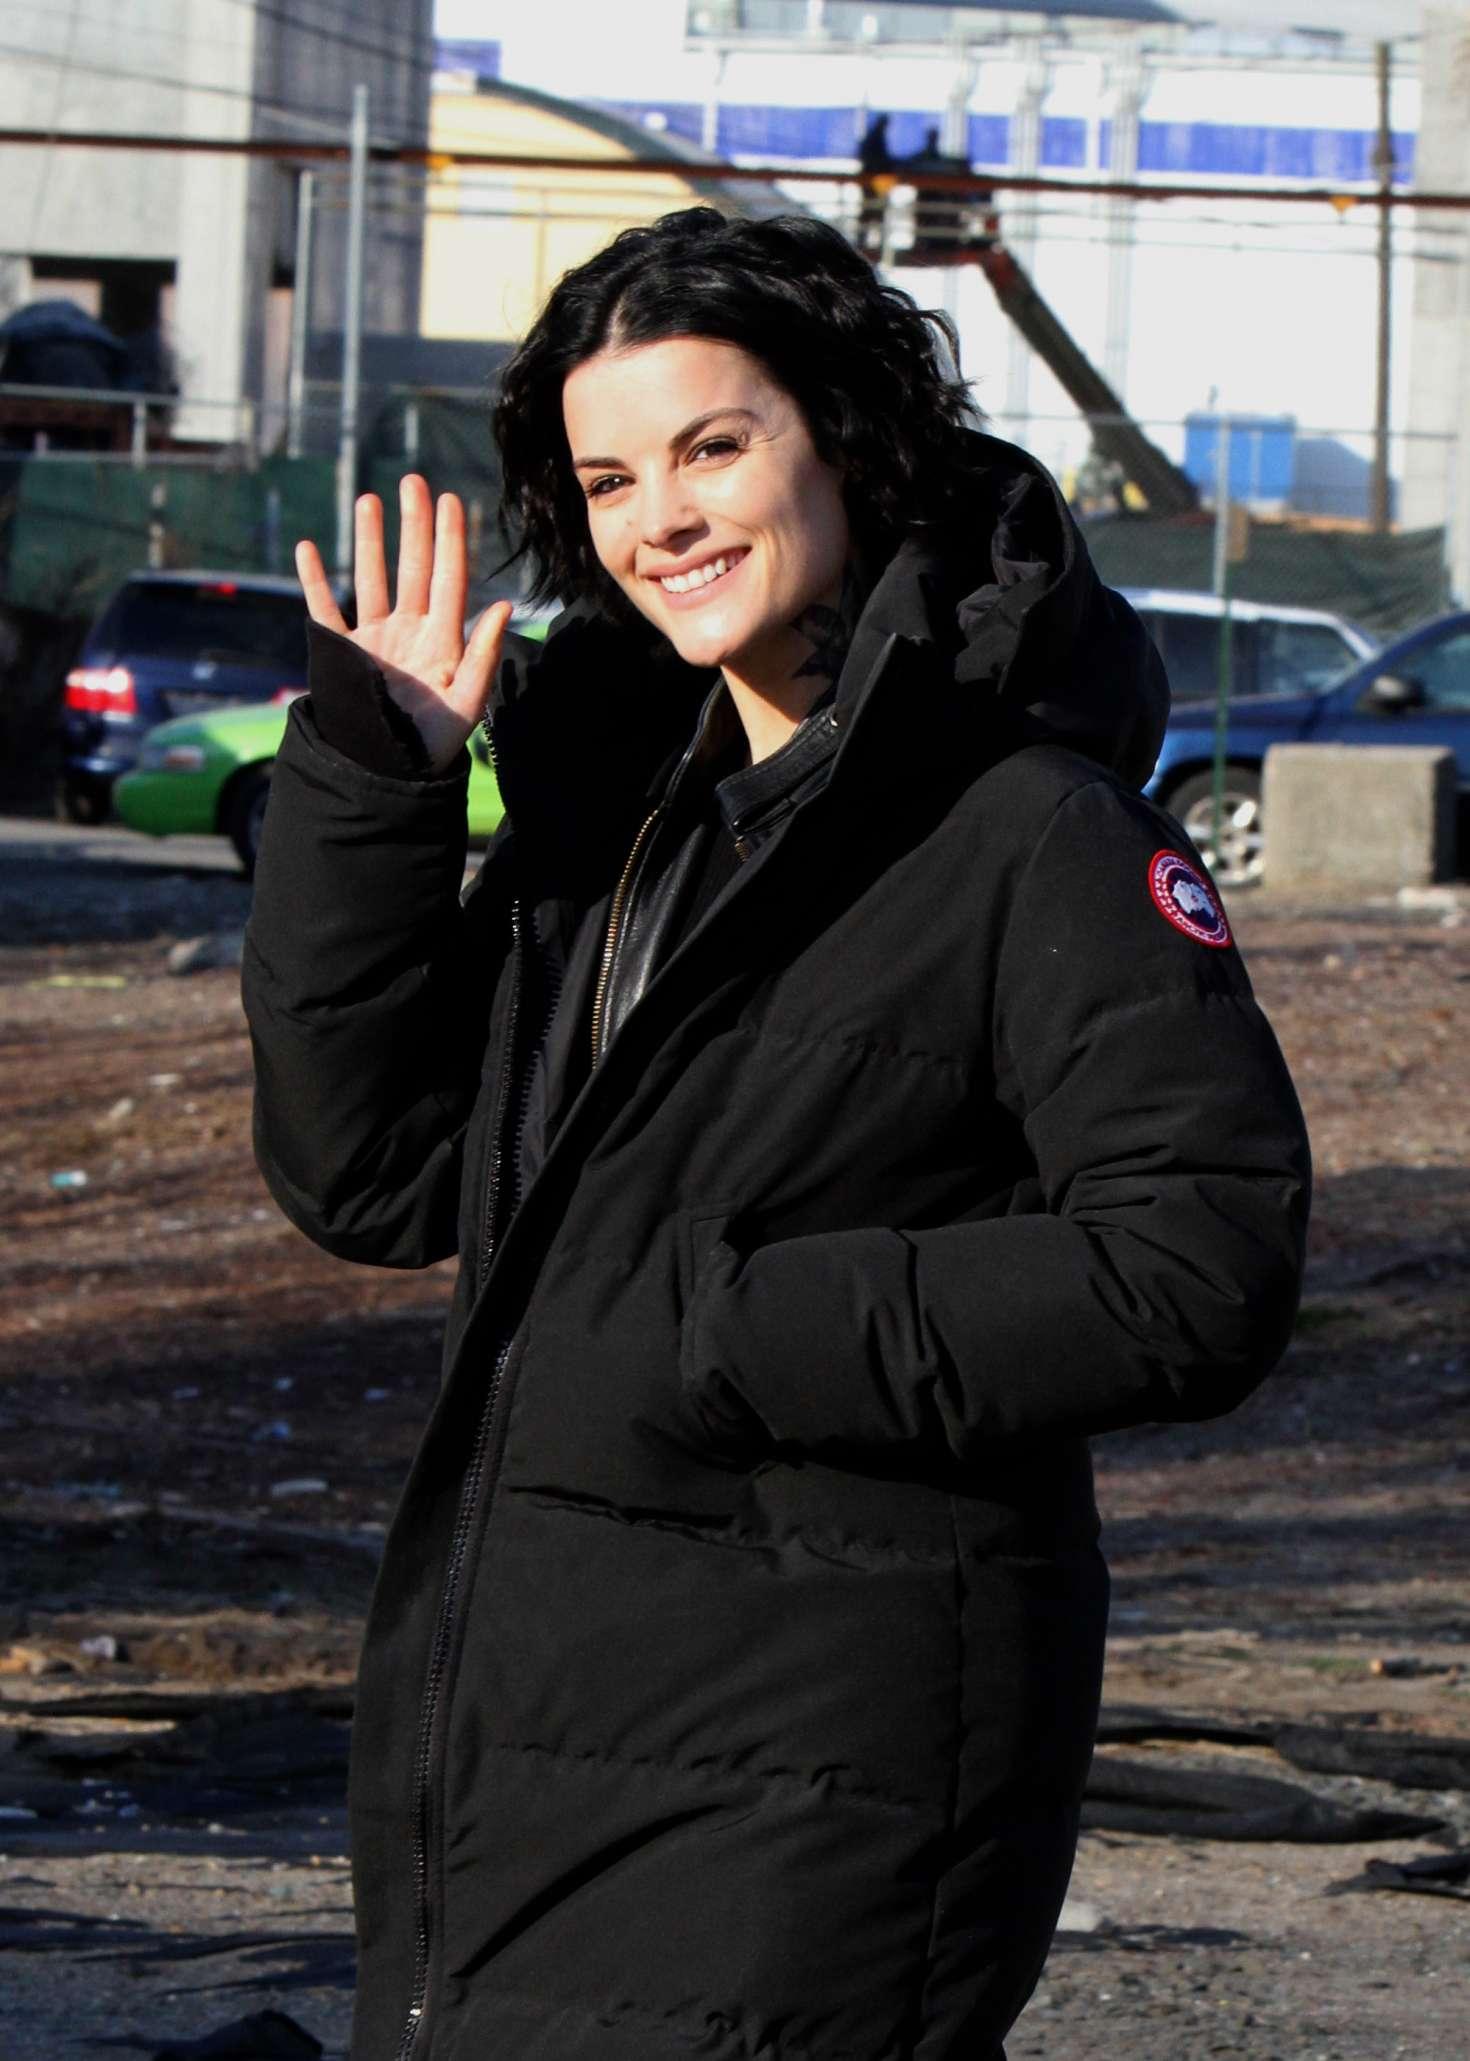 Jaimie Alexander - On the set of 'Blindspot' in Brooklyn